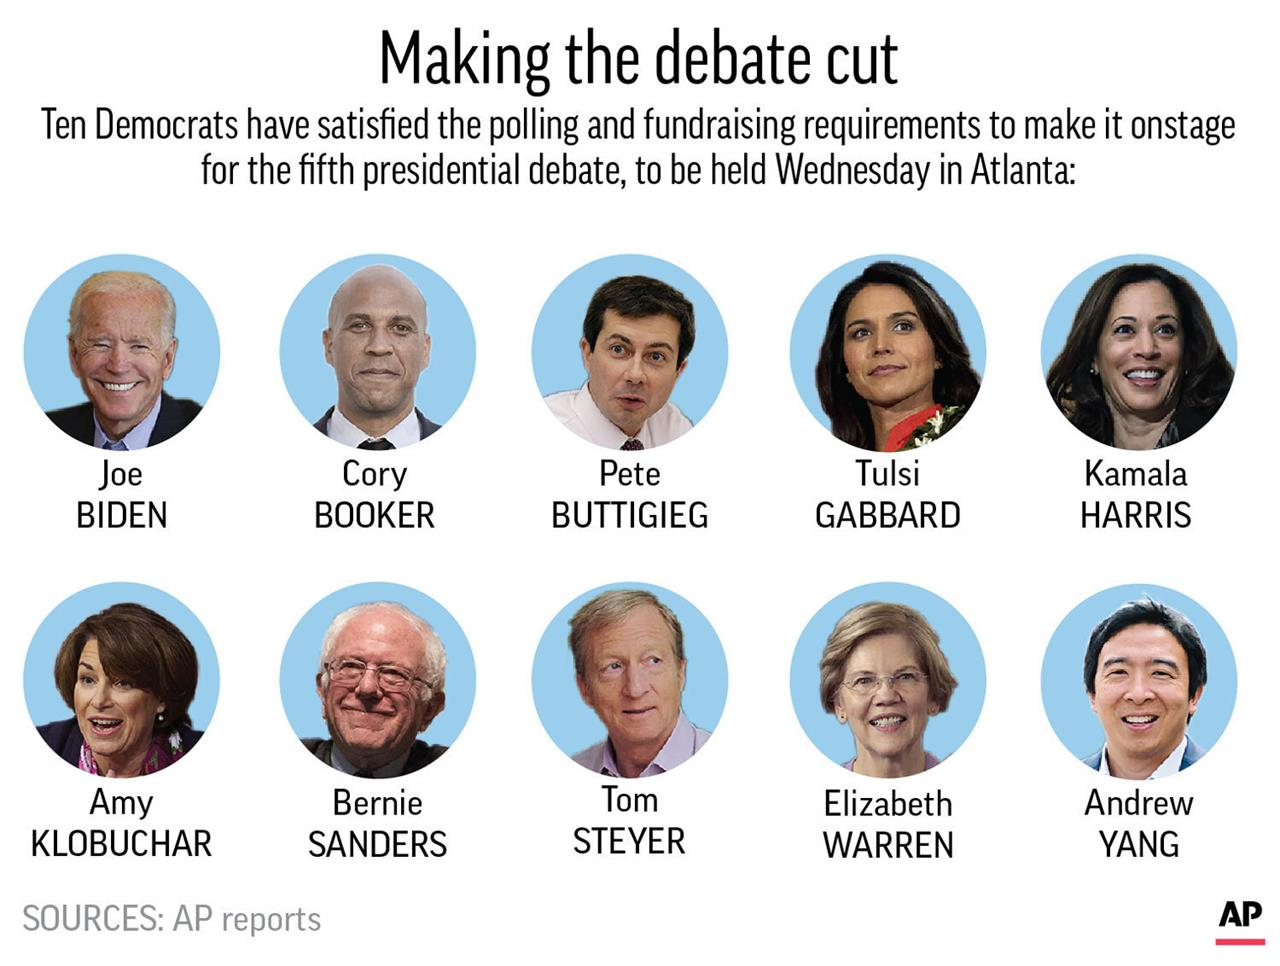 Democratic debate: Rising Buttigieg could face attacks